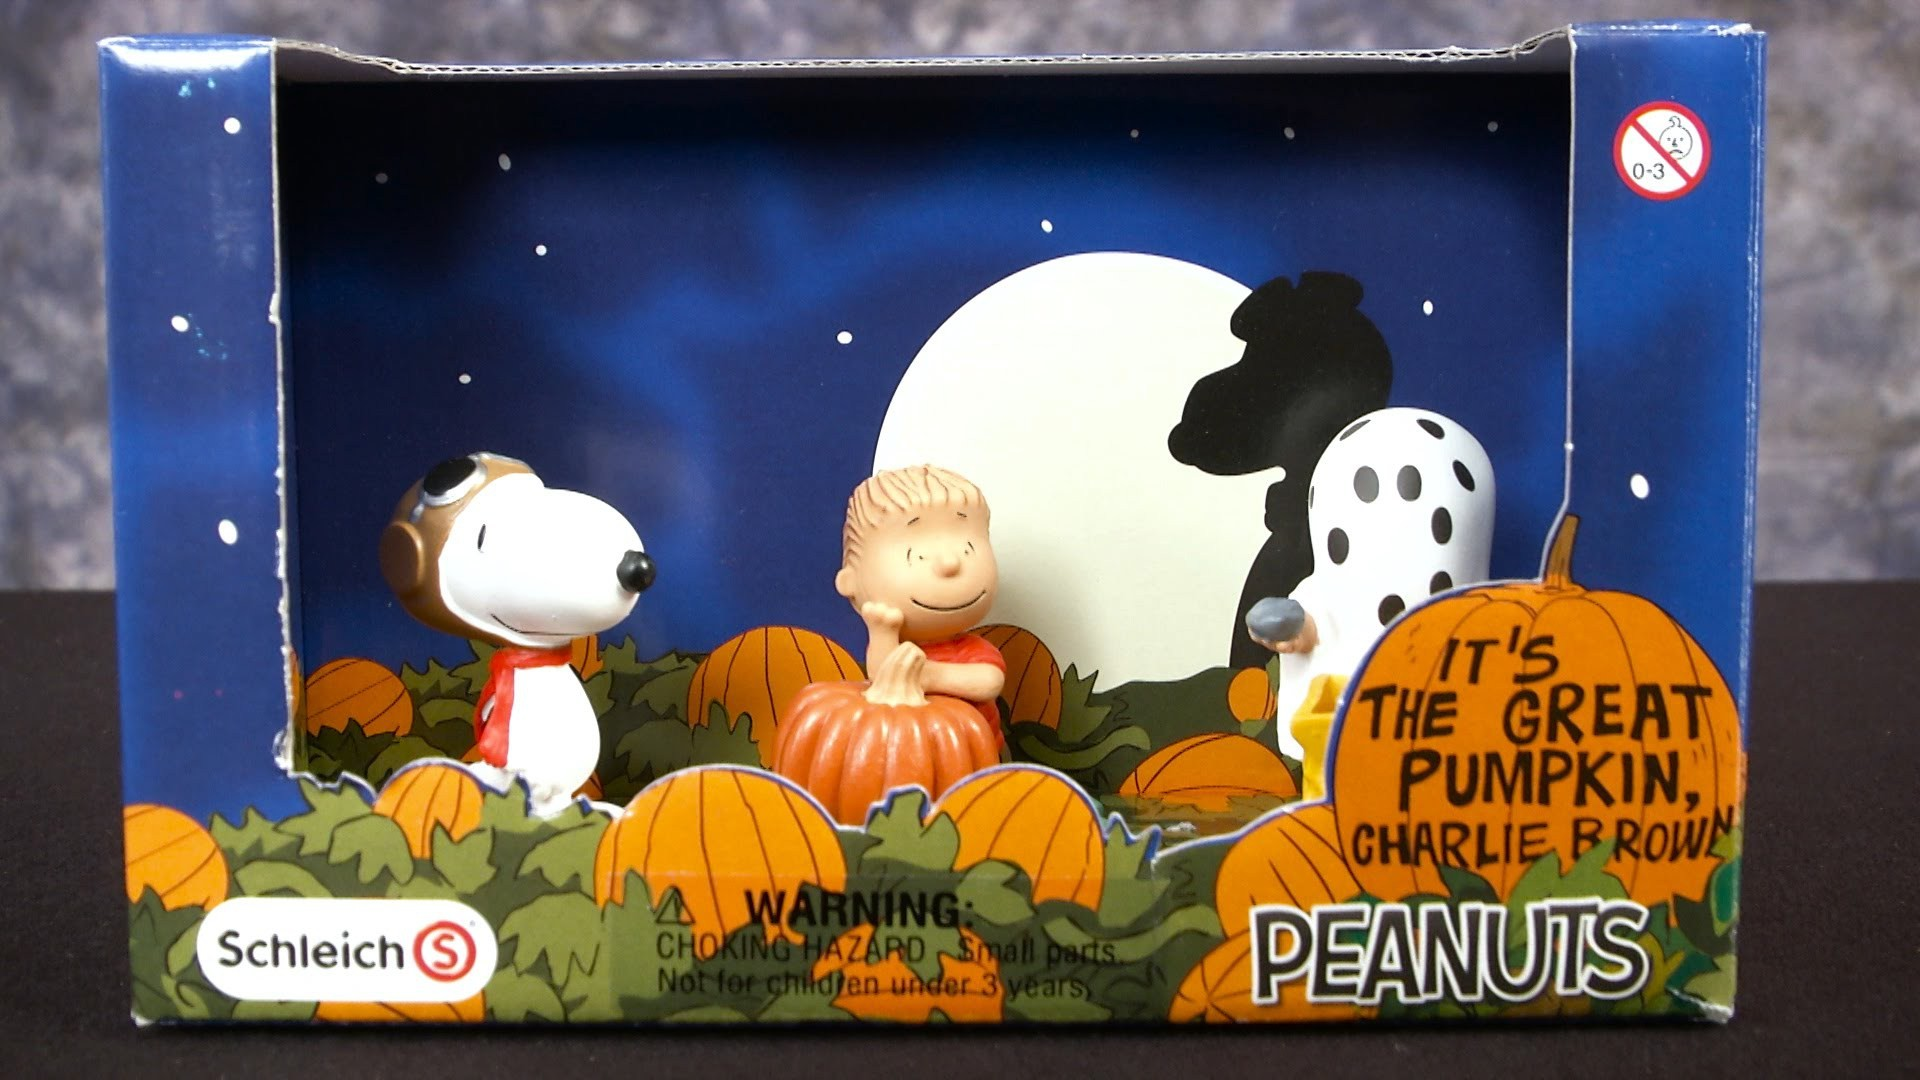 Great Pumpkin Charlie Brown Wallpaper Wallpapertag